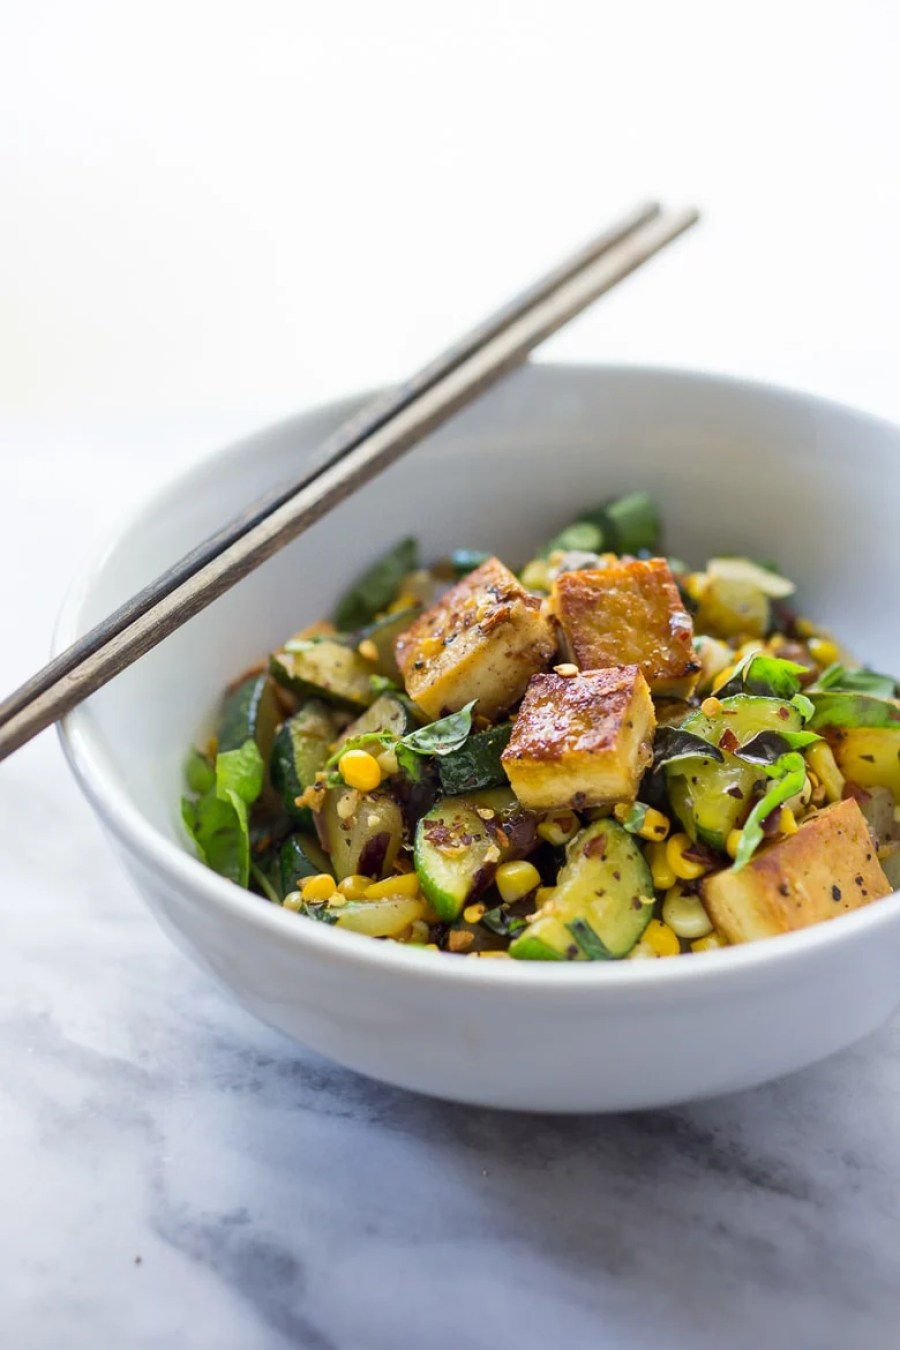 Zucchini, Corn and Basil Stir-fry